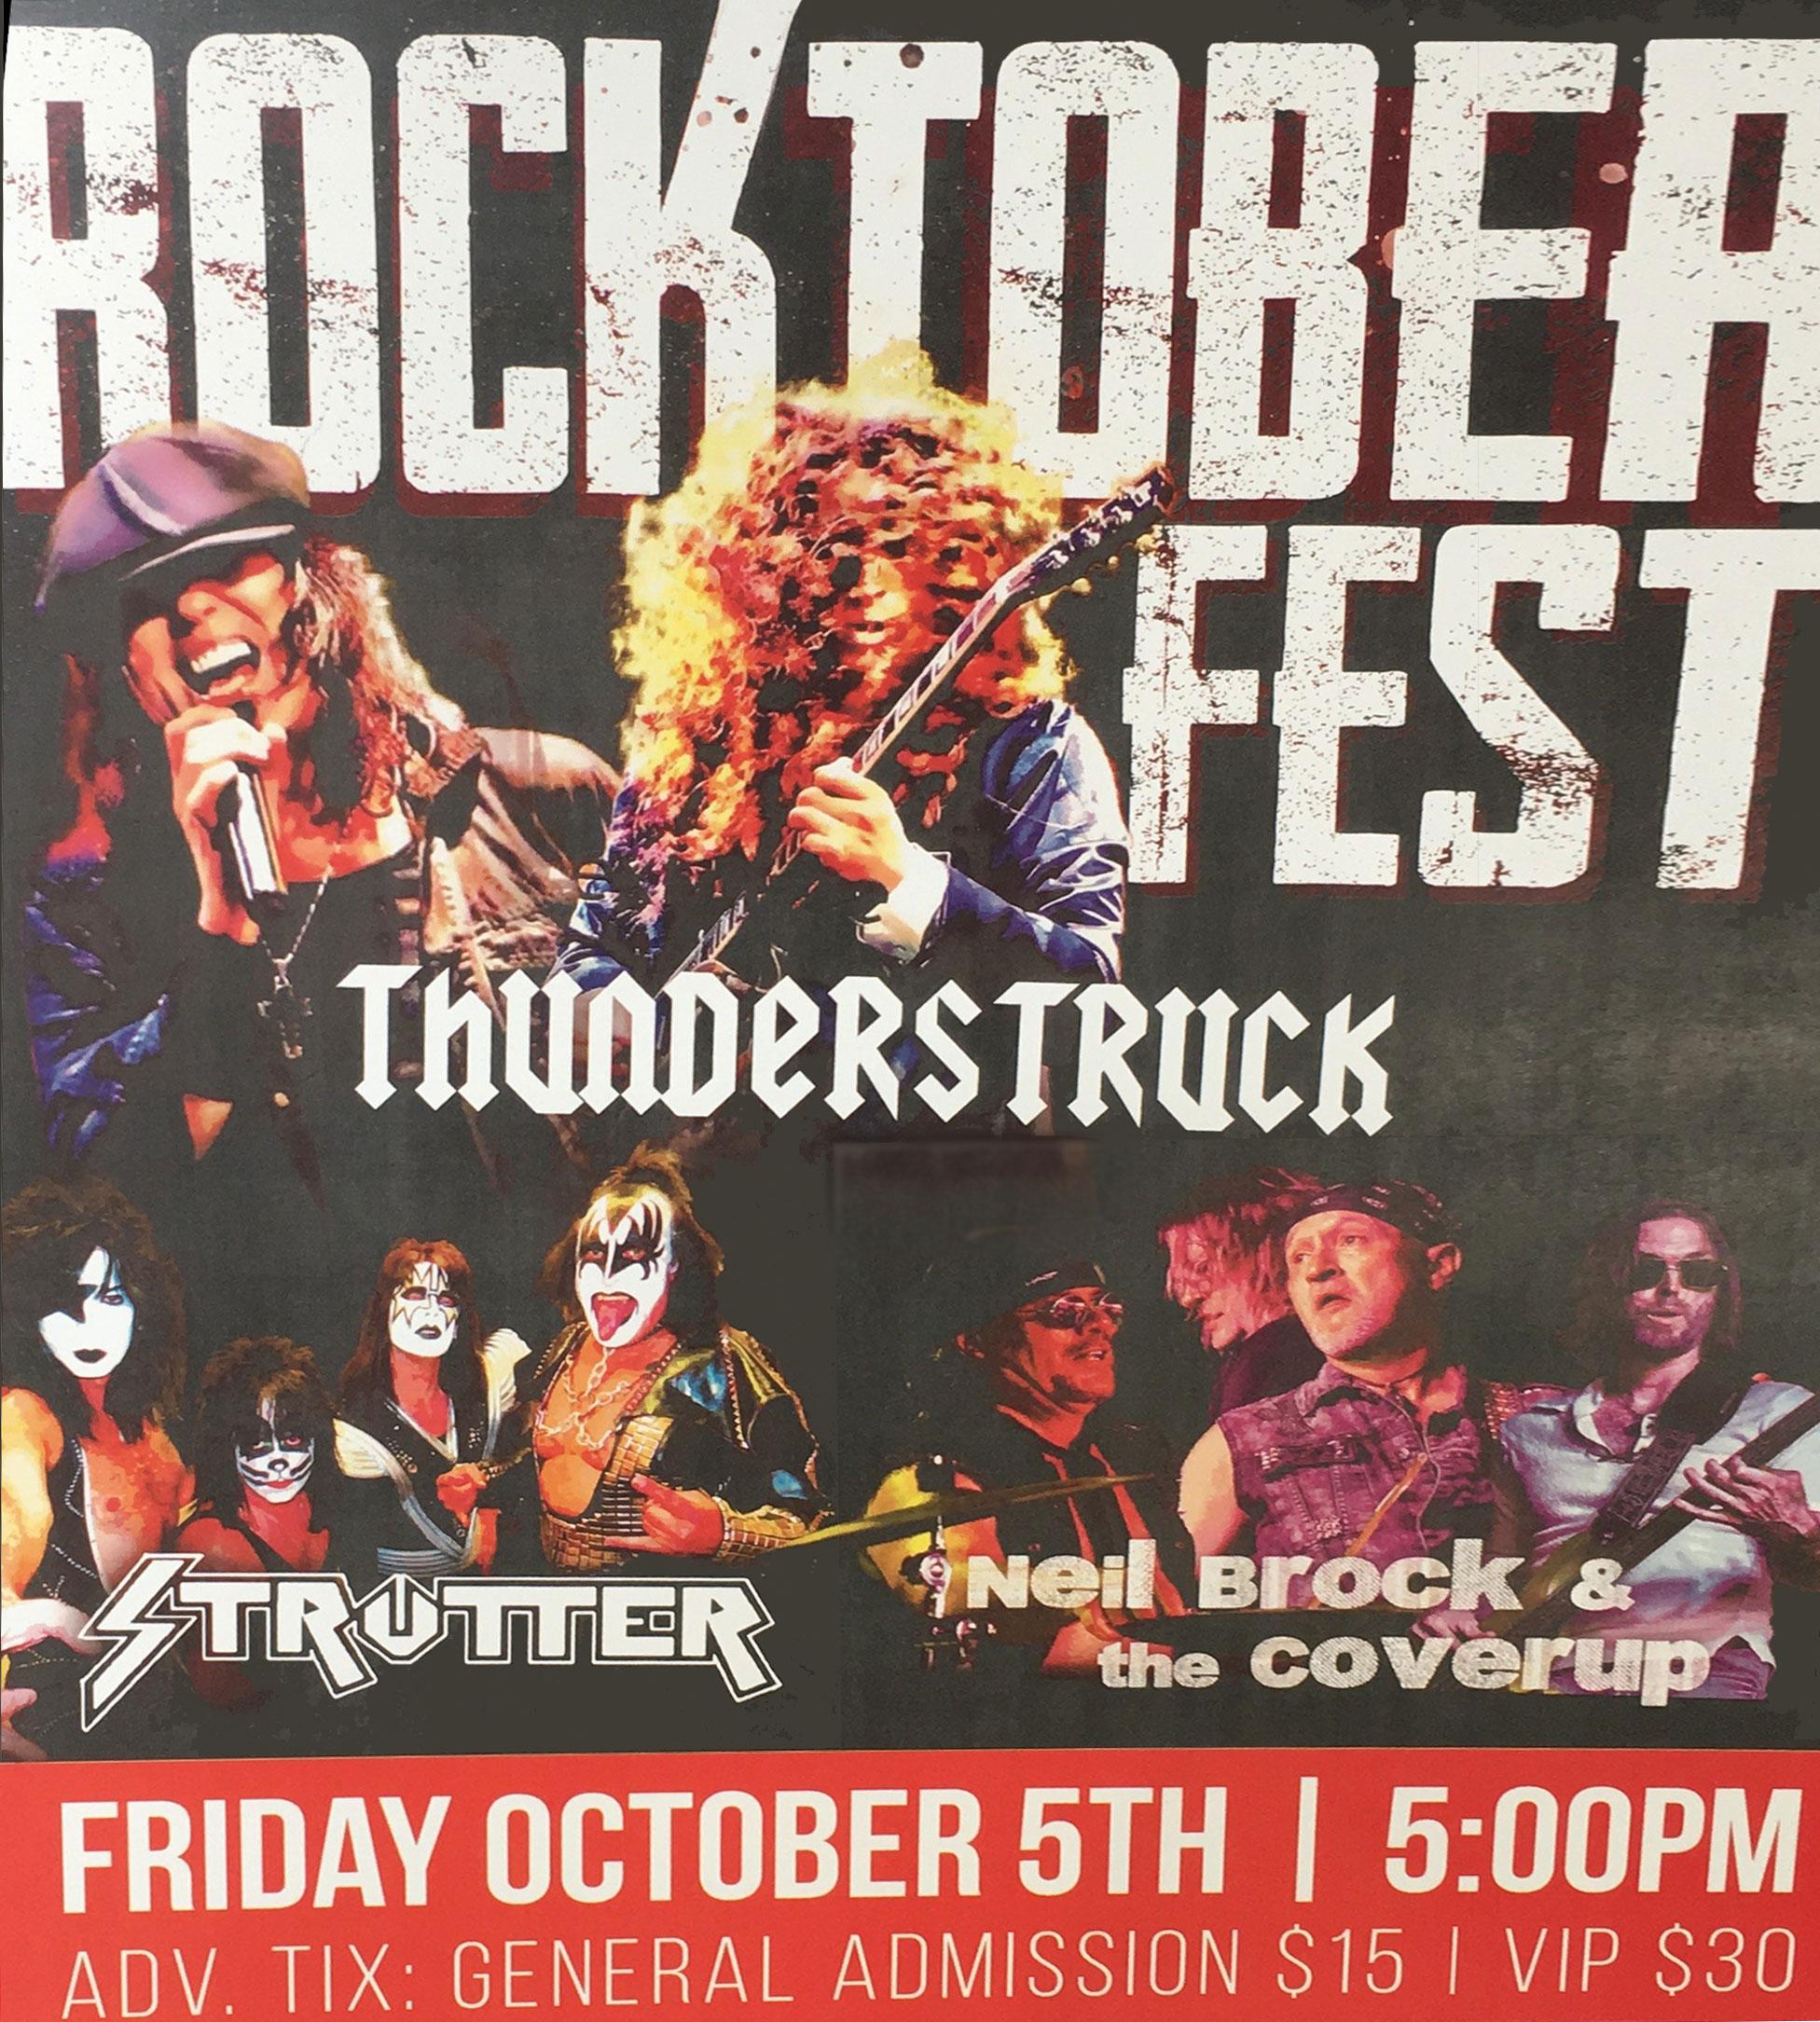 rocktoberfest Clarksville Oconnors